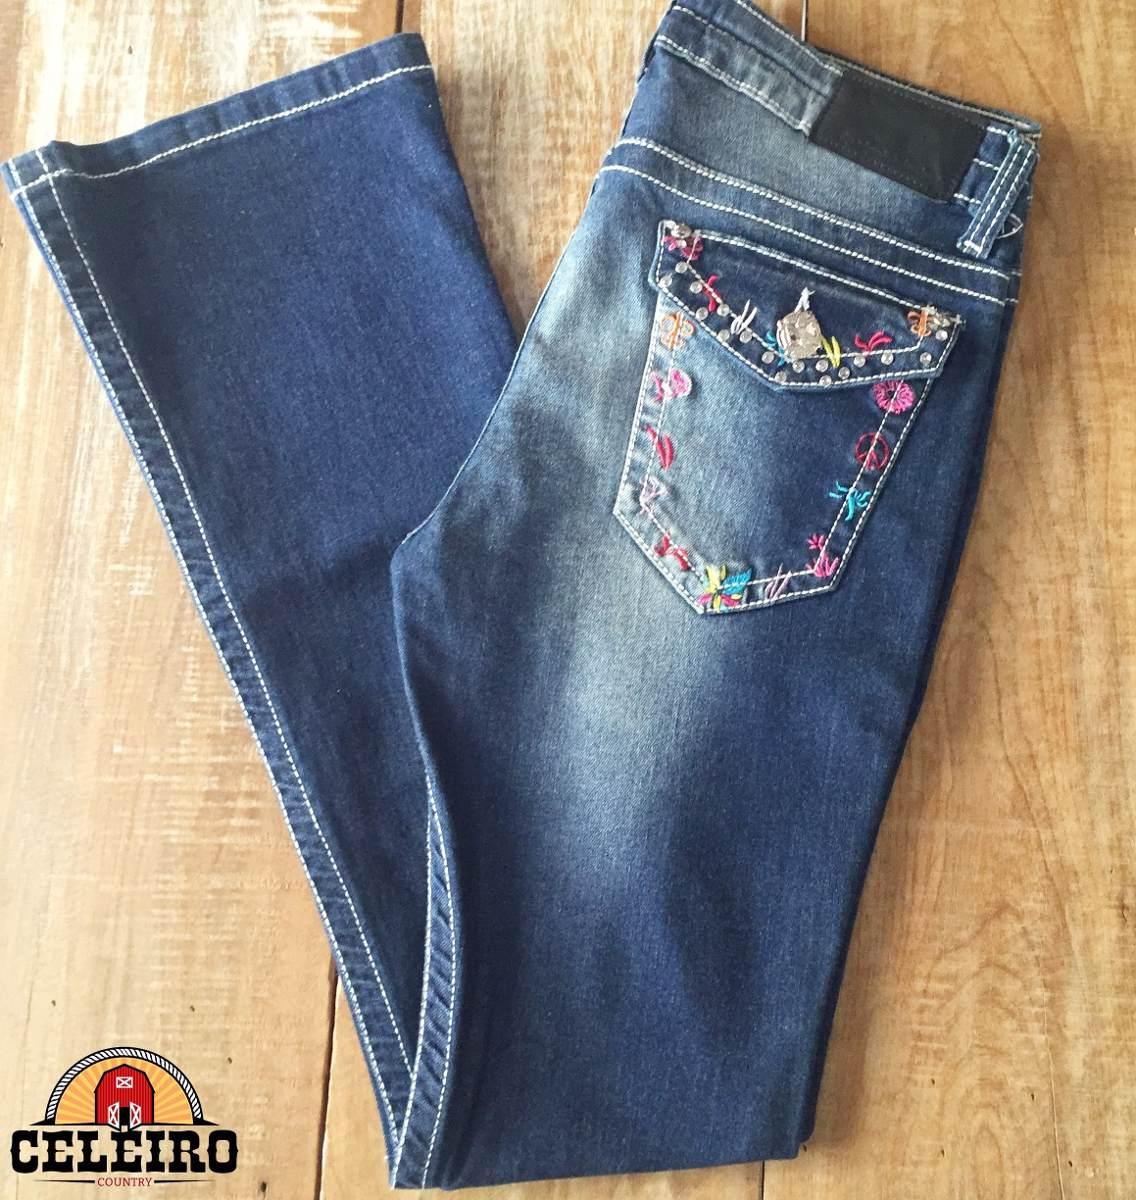 calça jeans flare feminina botanical garden zenz western. Carregando zoom. 642a08dd26f